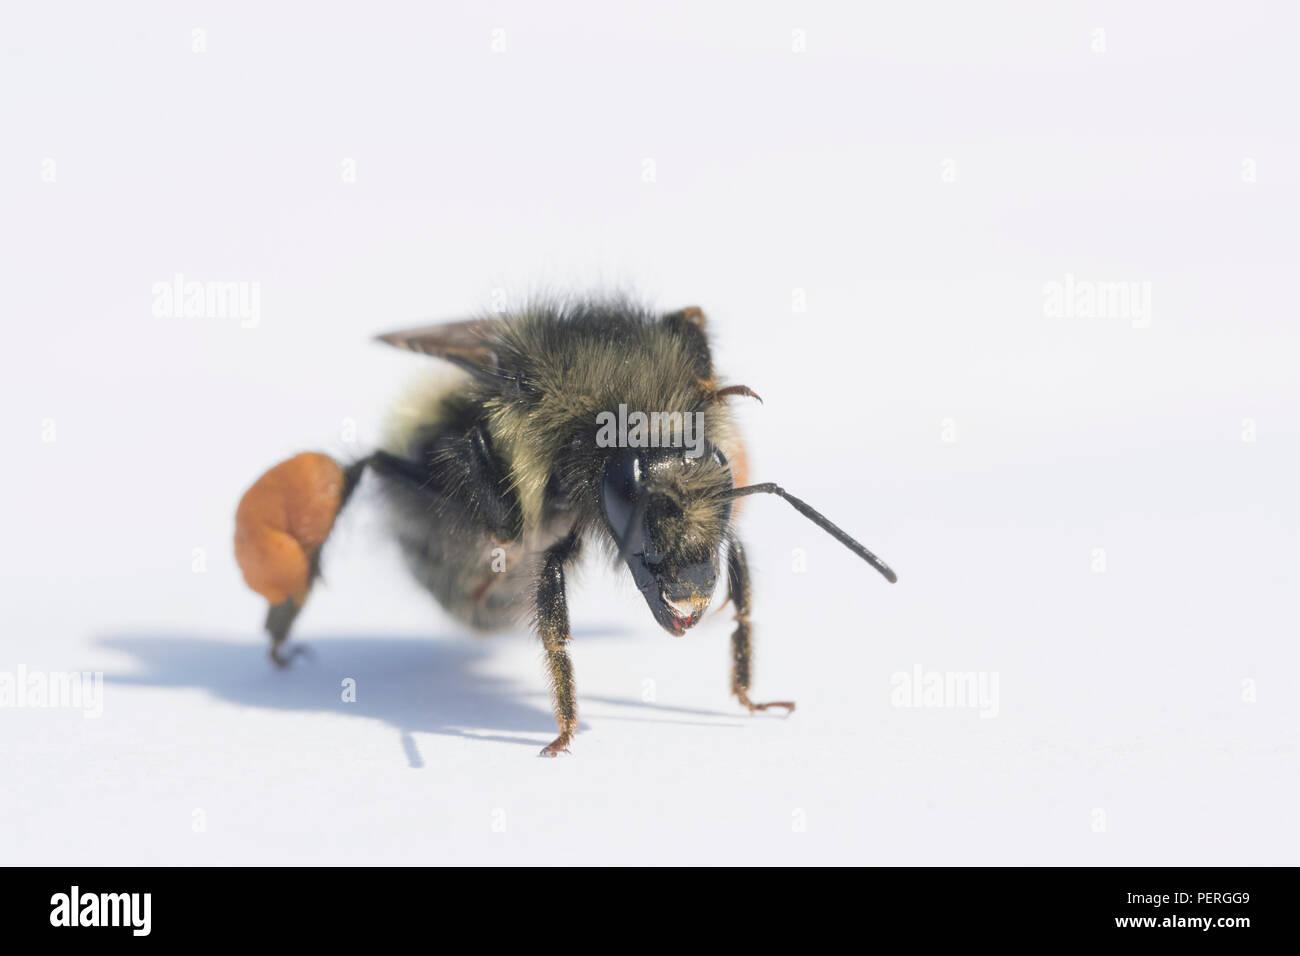 Yellow-head Bumblebee (Bombus flavifrons) Female carrying pollen, Cascade Mountains, Washington - Stock Image